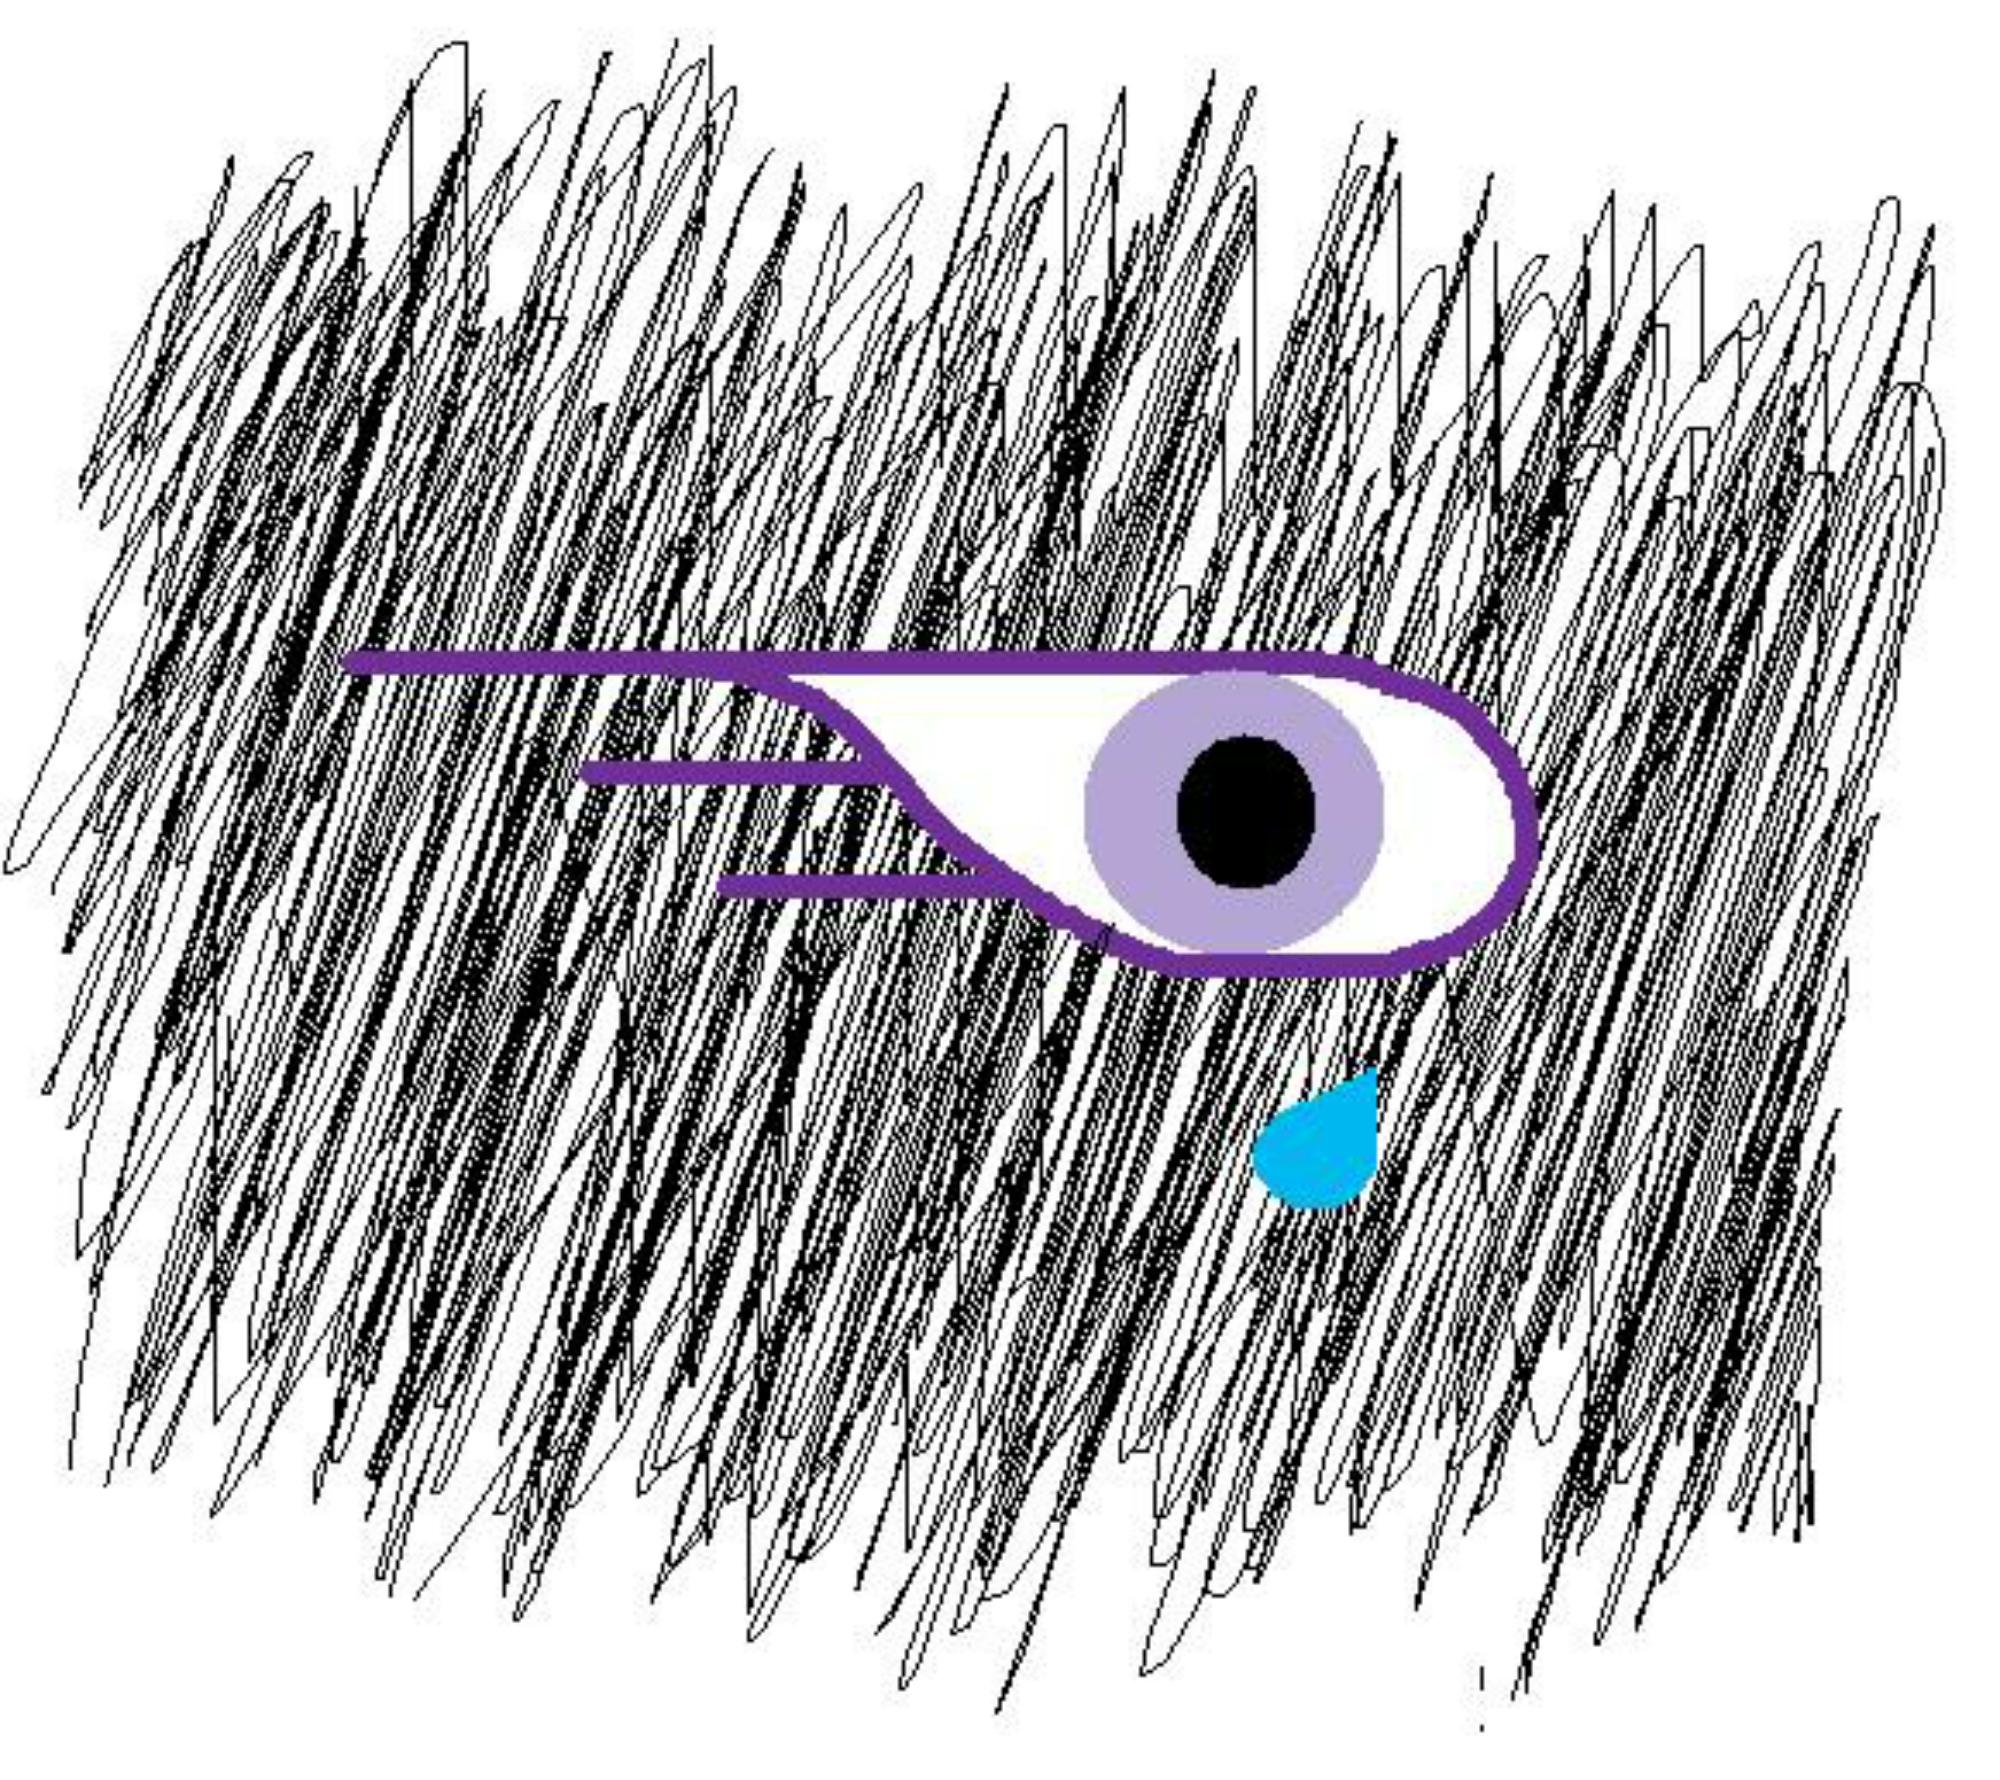 Justin Peavey DRAWING eye design big png